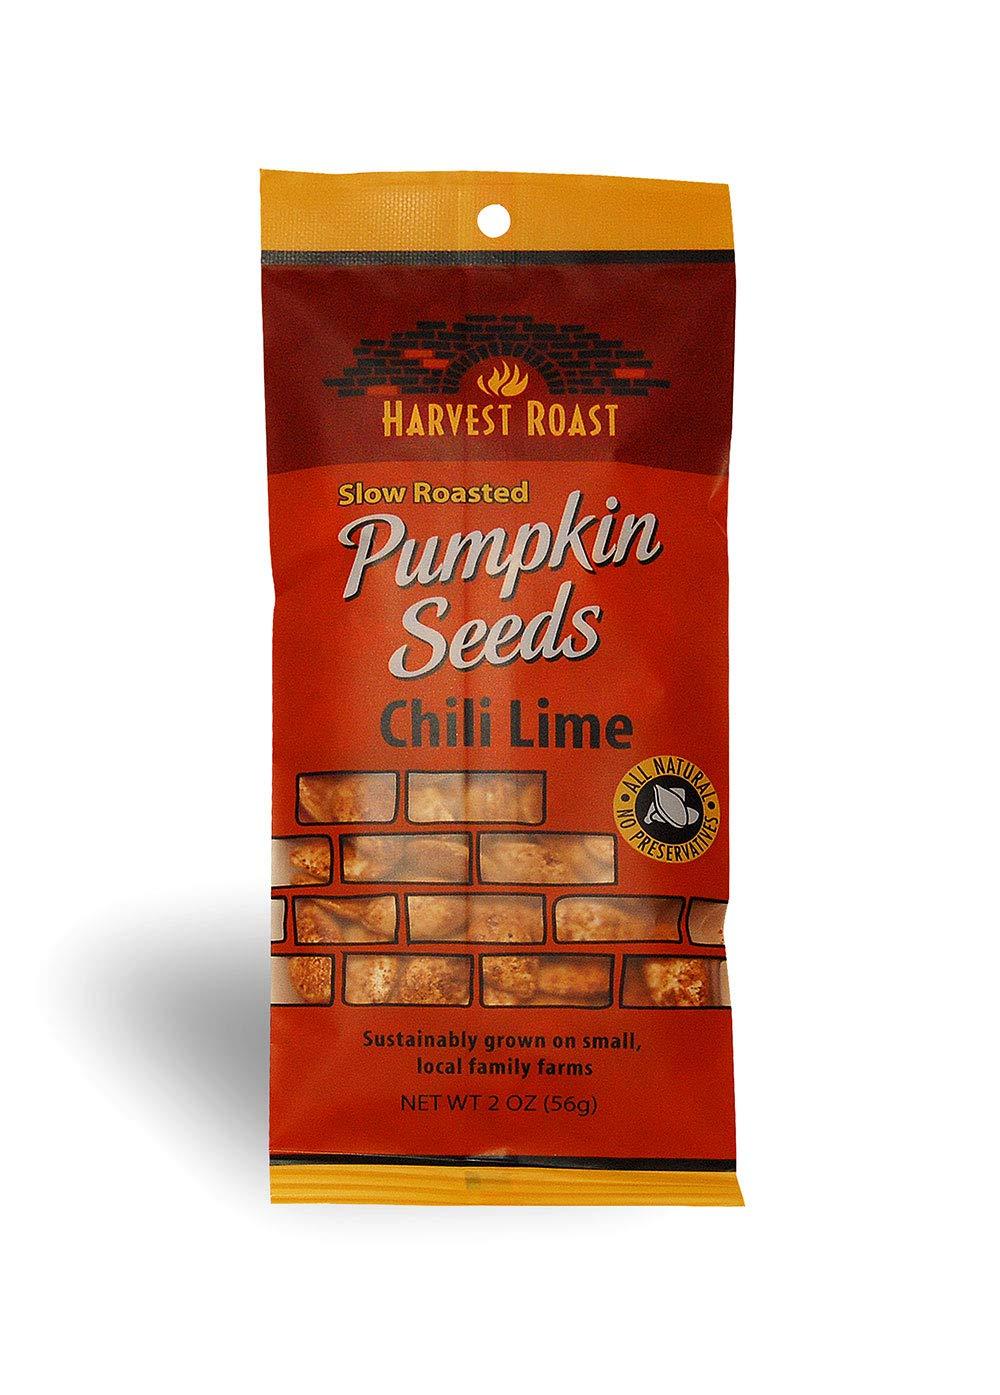 Harvest Roast: Slow Roasted Chili Lime Pumpkin Seeds 2 Oz (12 Pack) by